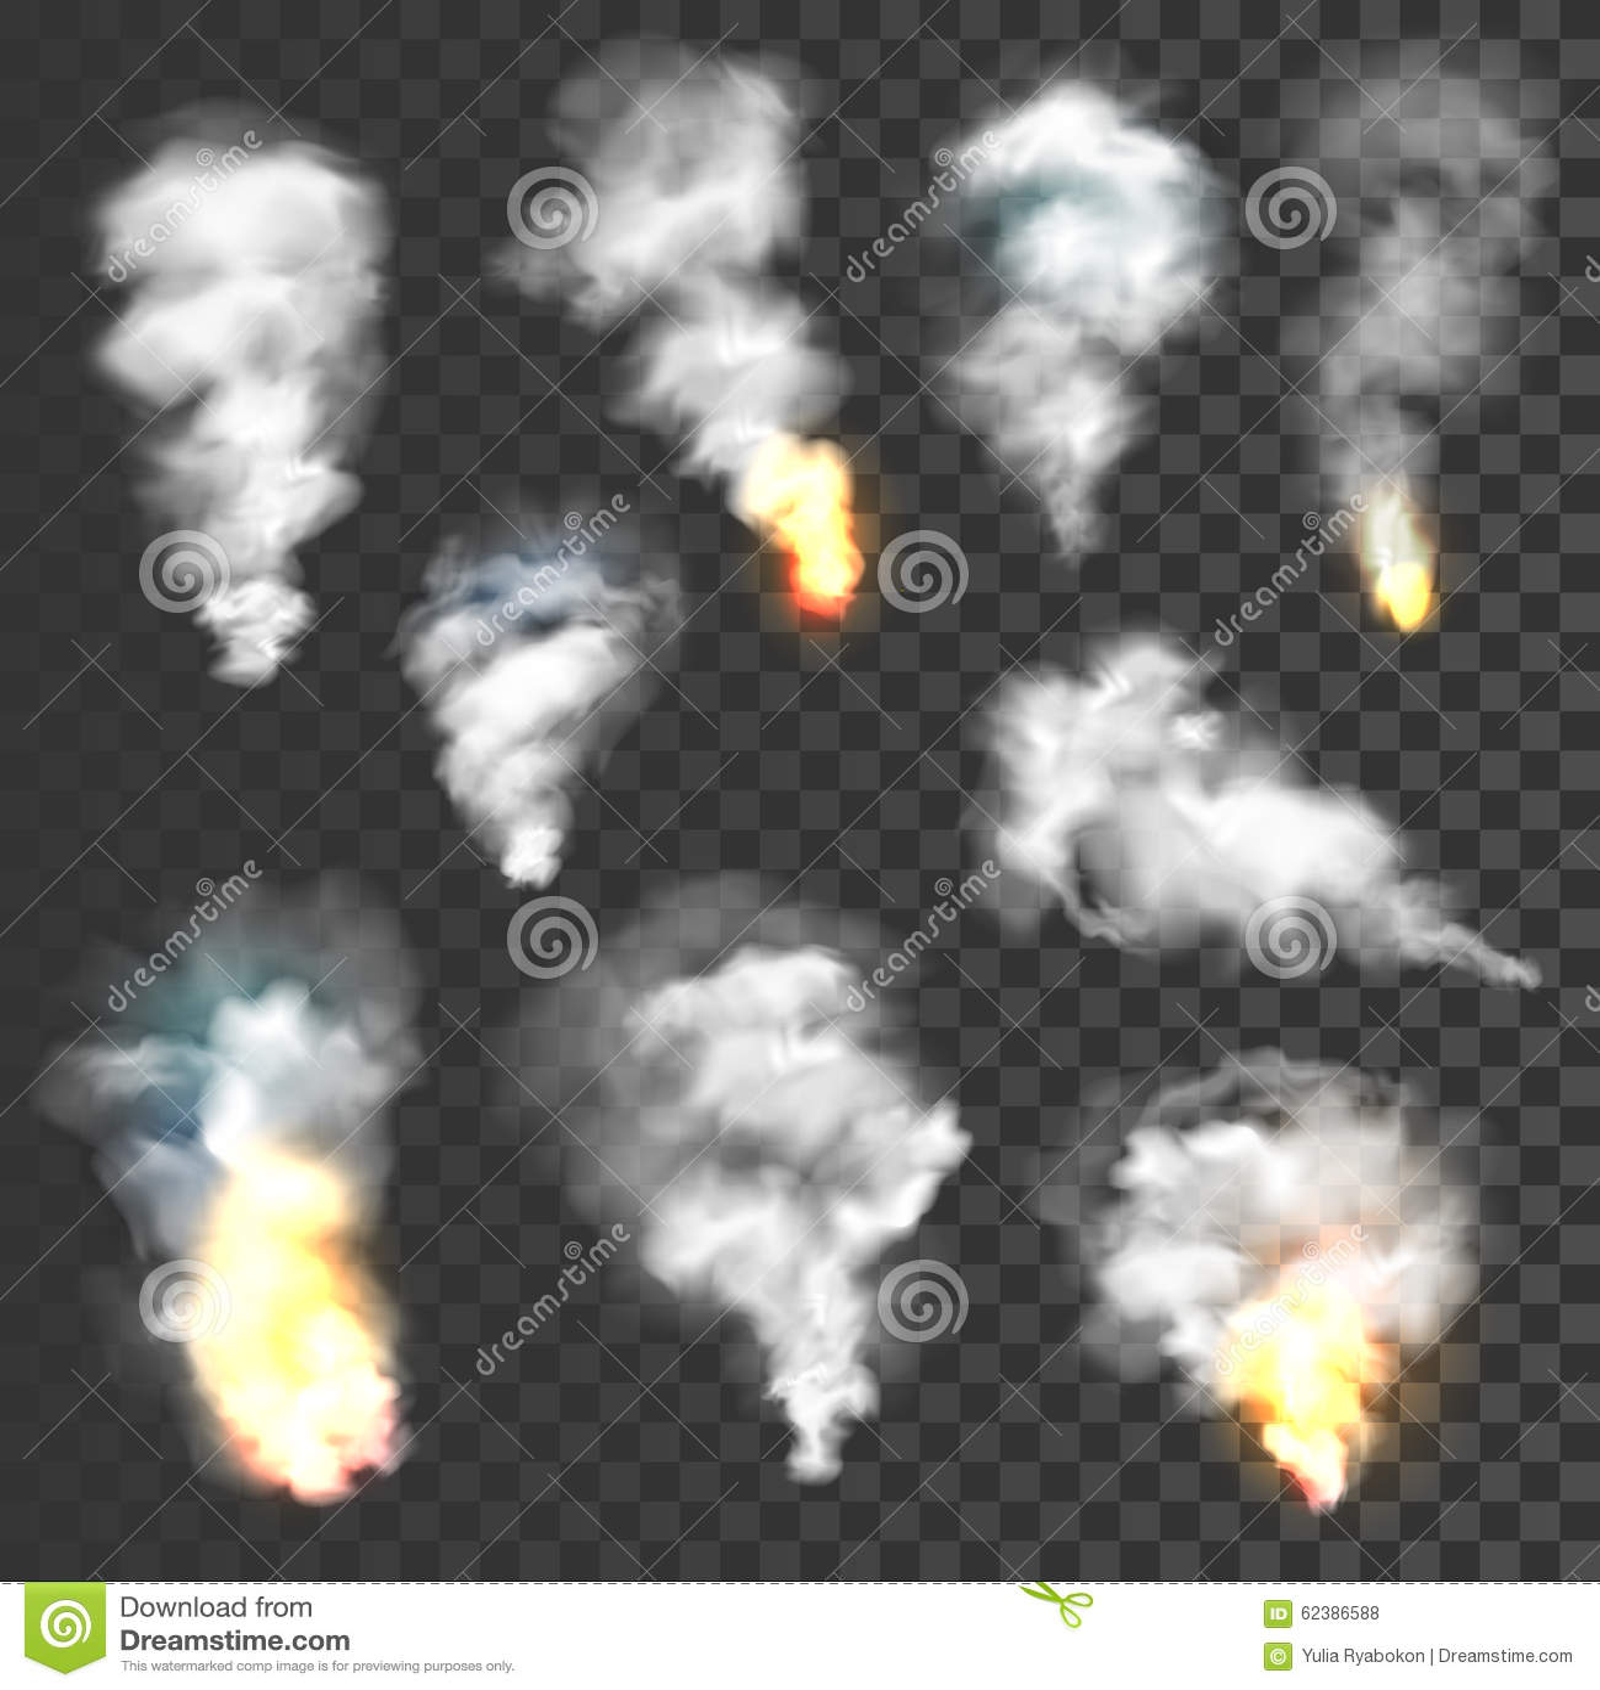 Smoke and fire set